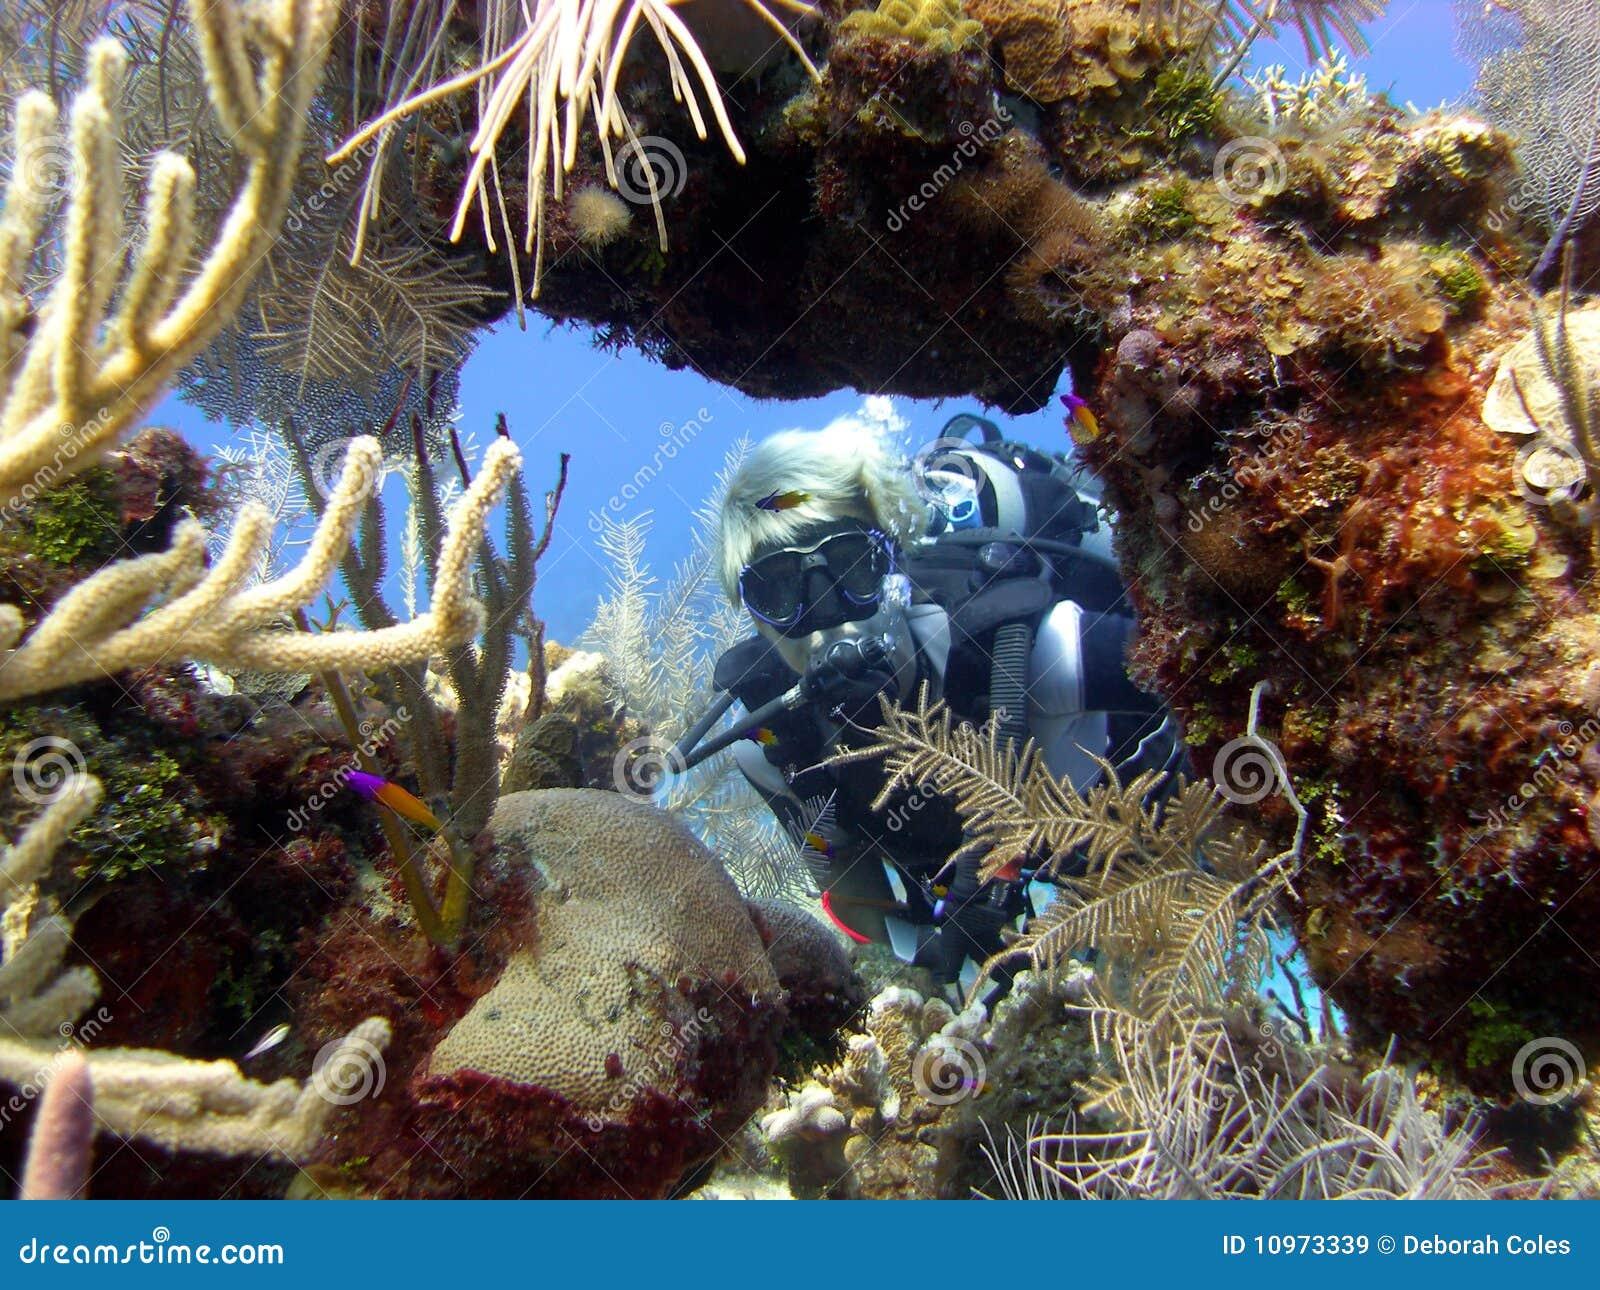 Diver enjoys a sunny dive